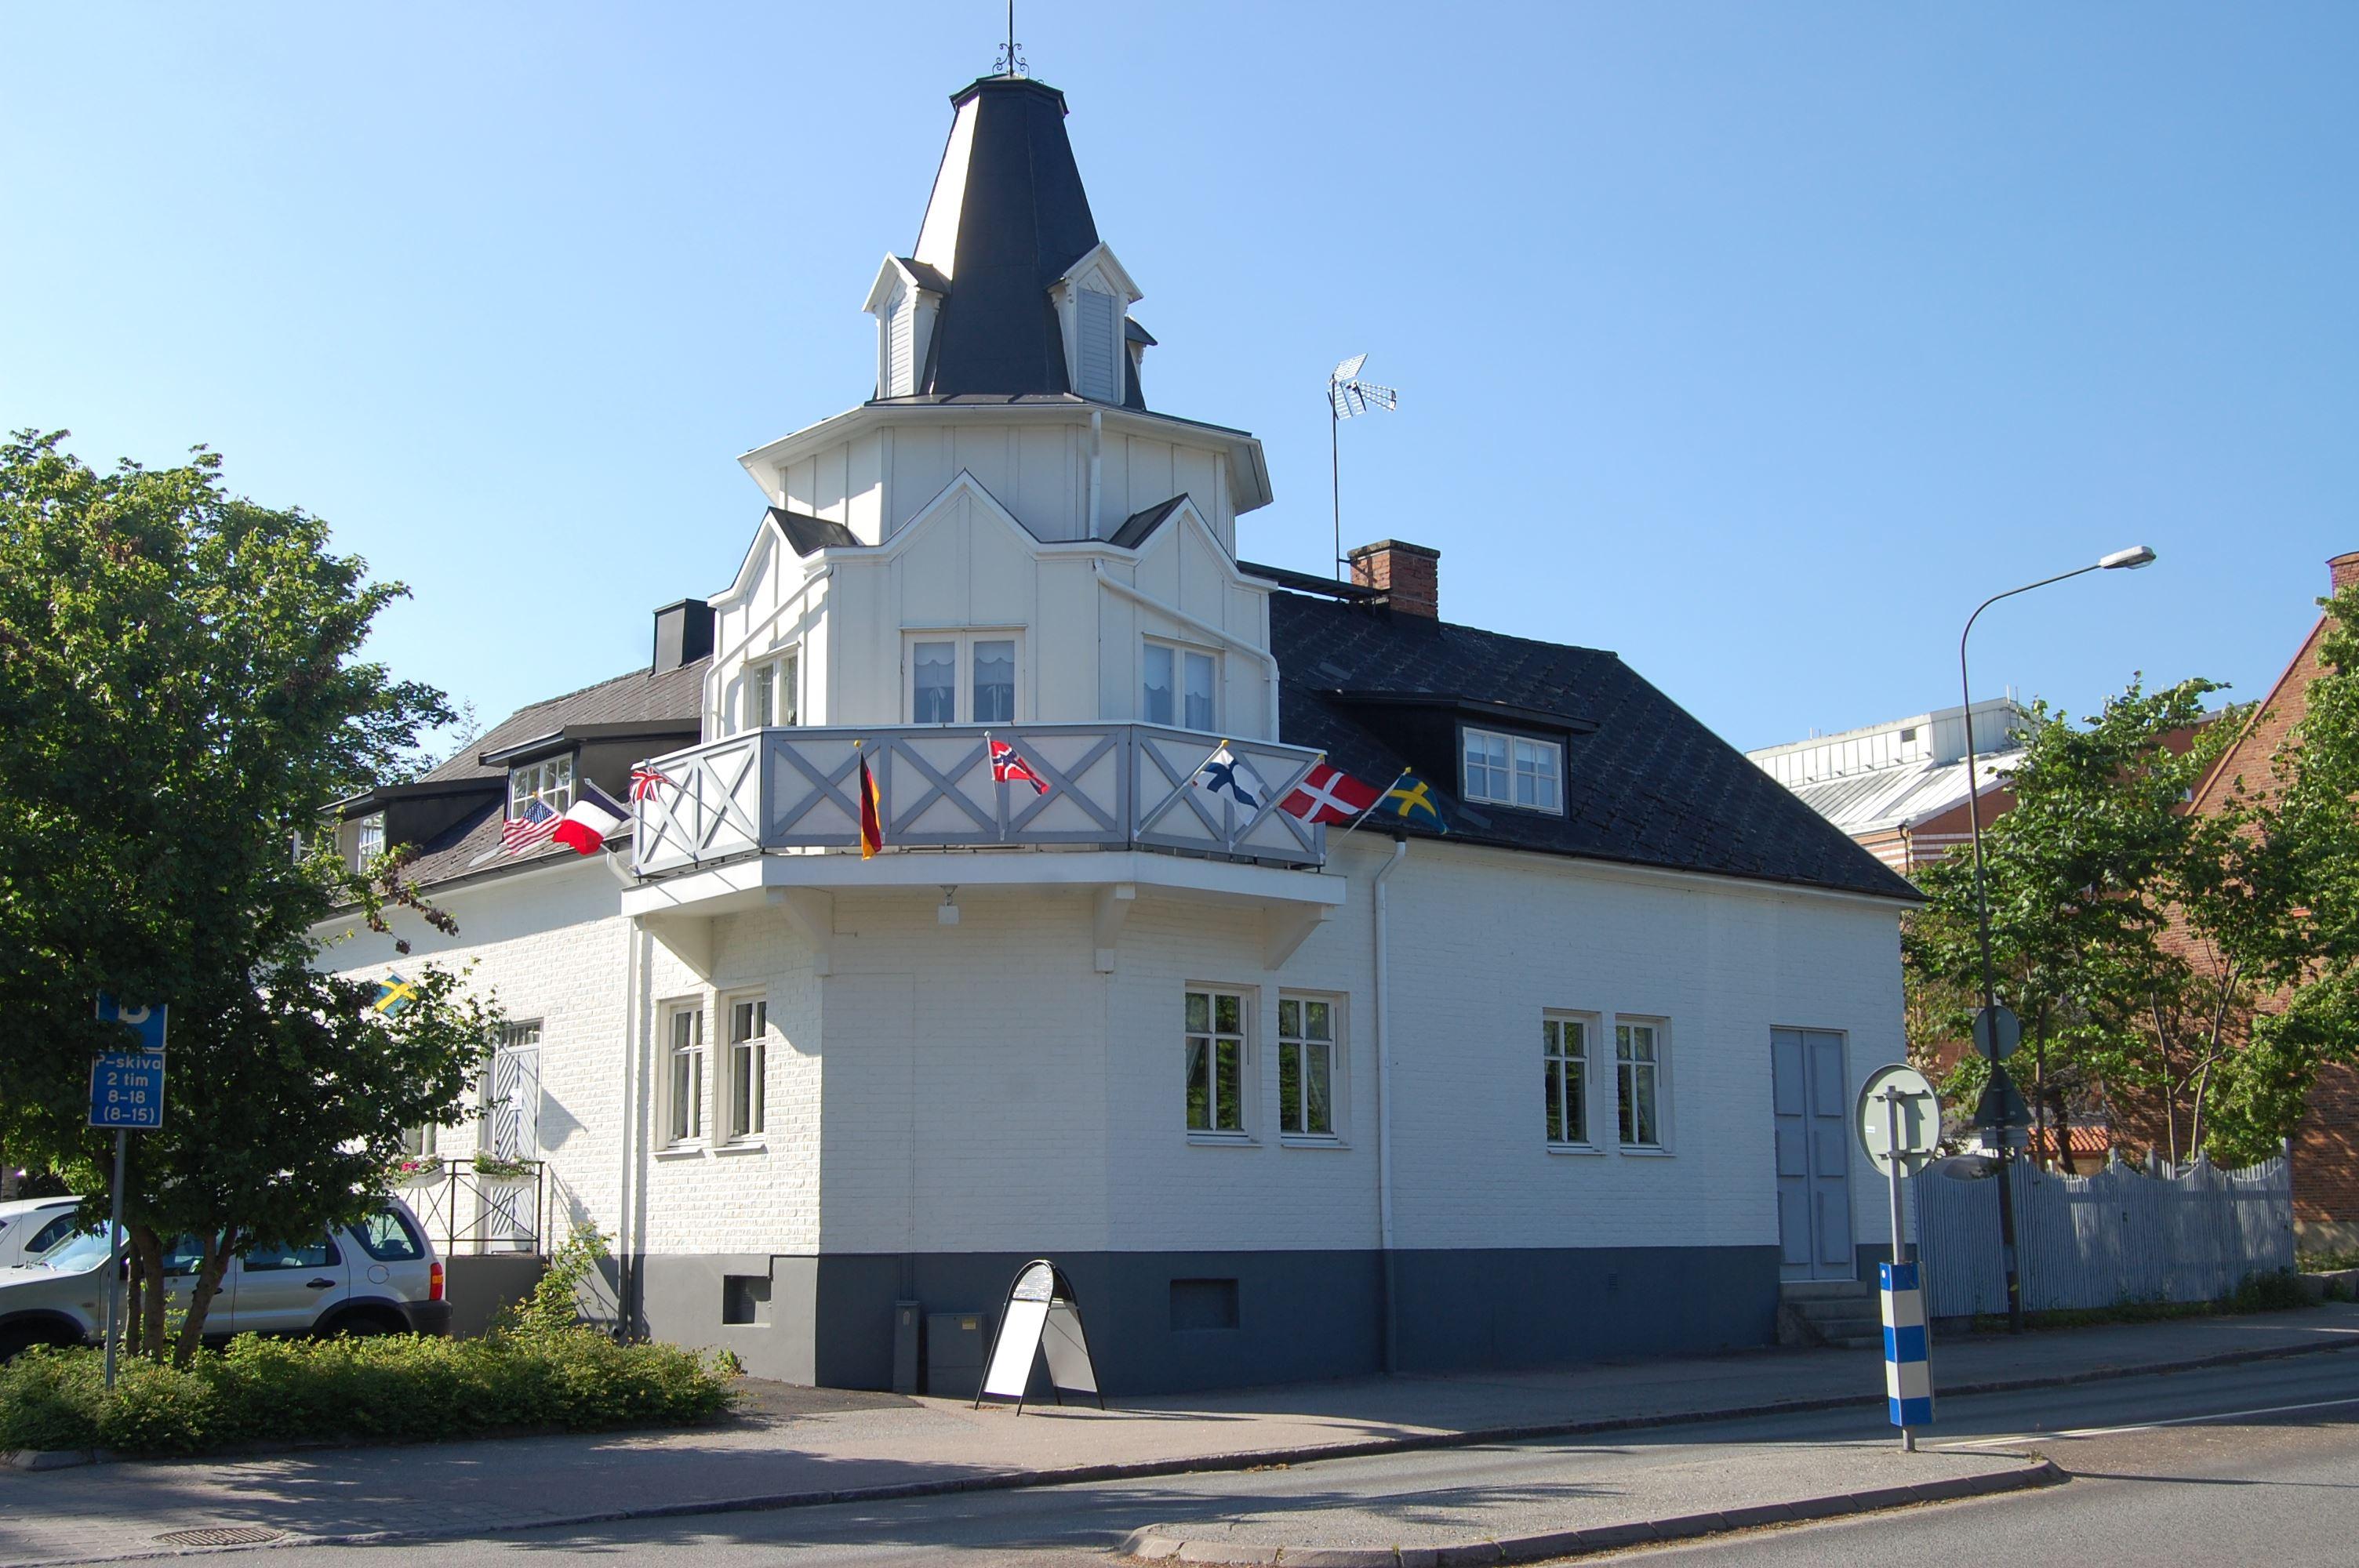 Djur i Slvesborg - Blocket